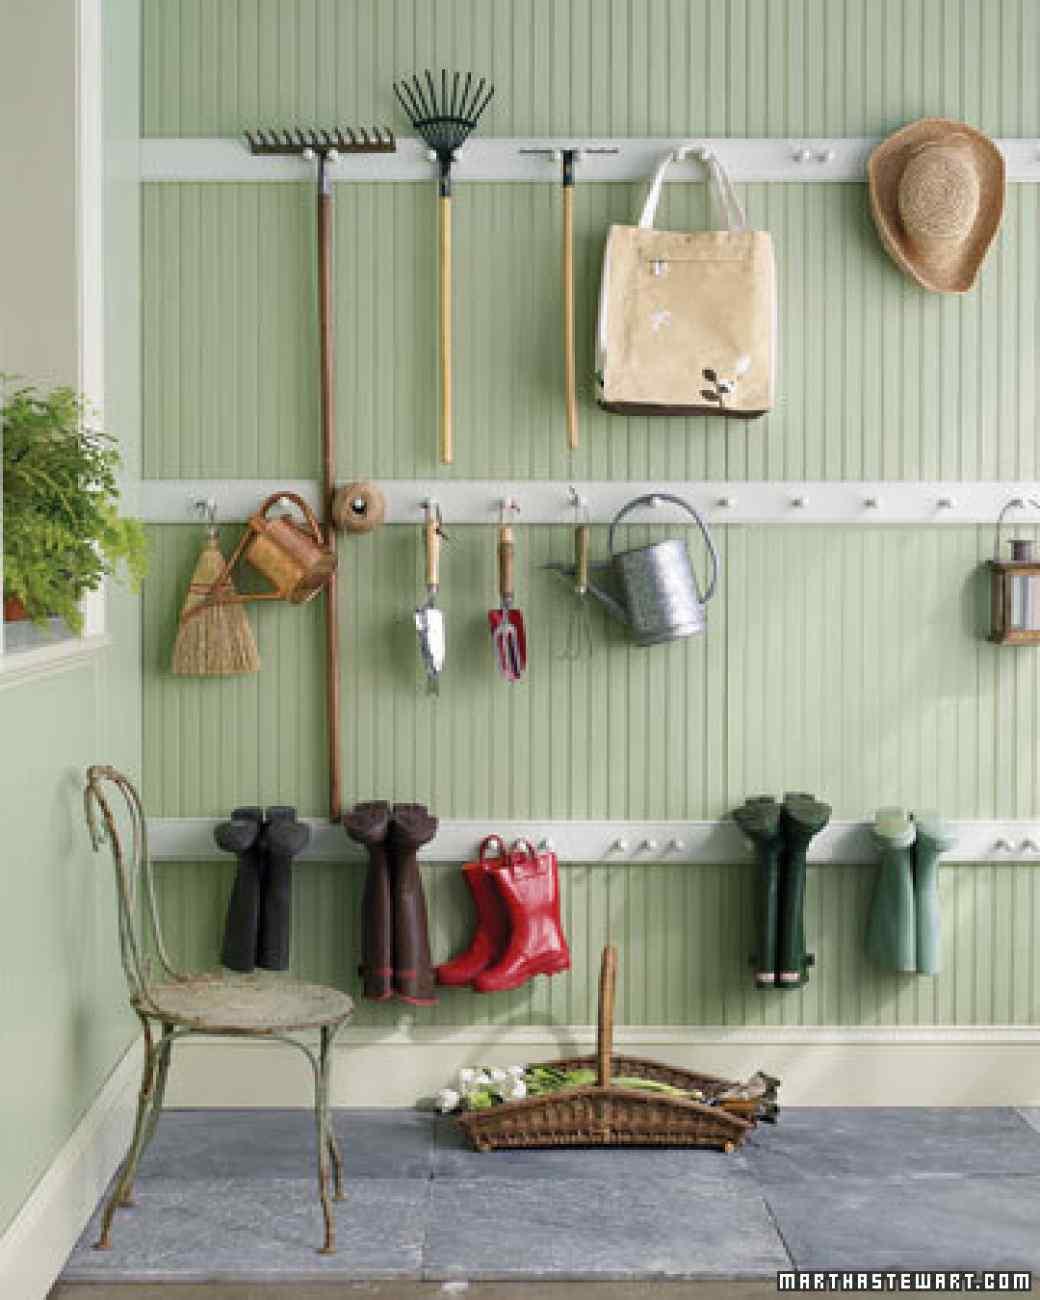 30+ Creative Ways to Organize Your Garage --> DIY peg-rail organizer to keep everything off the floor